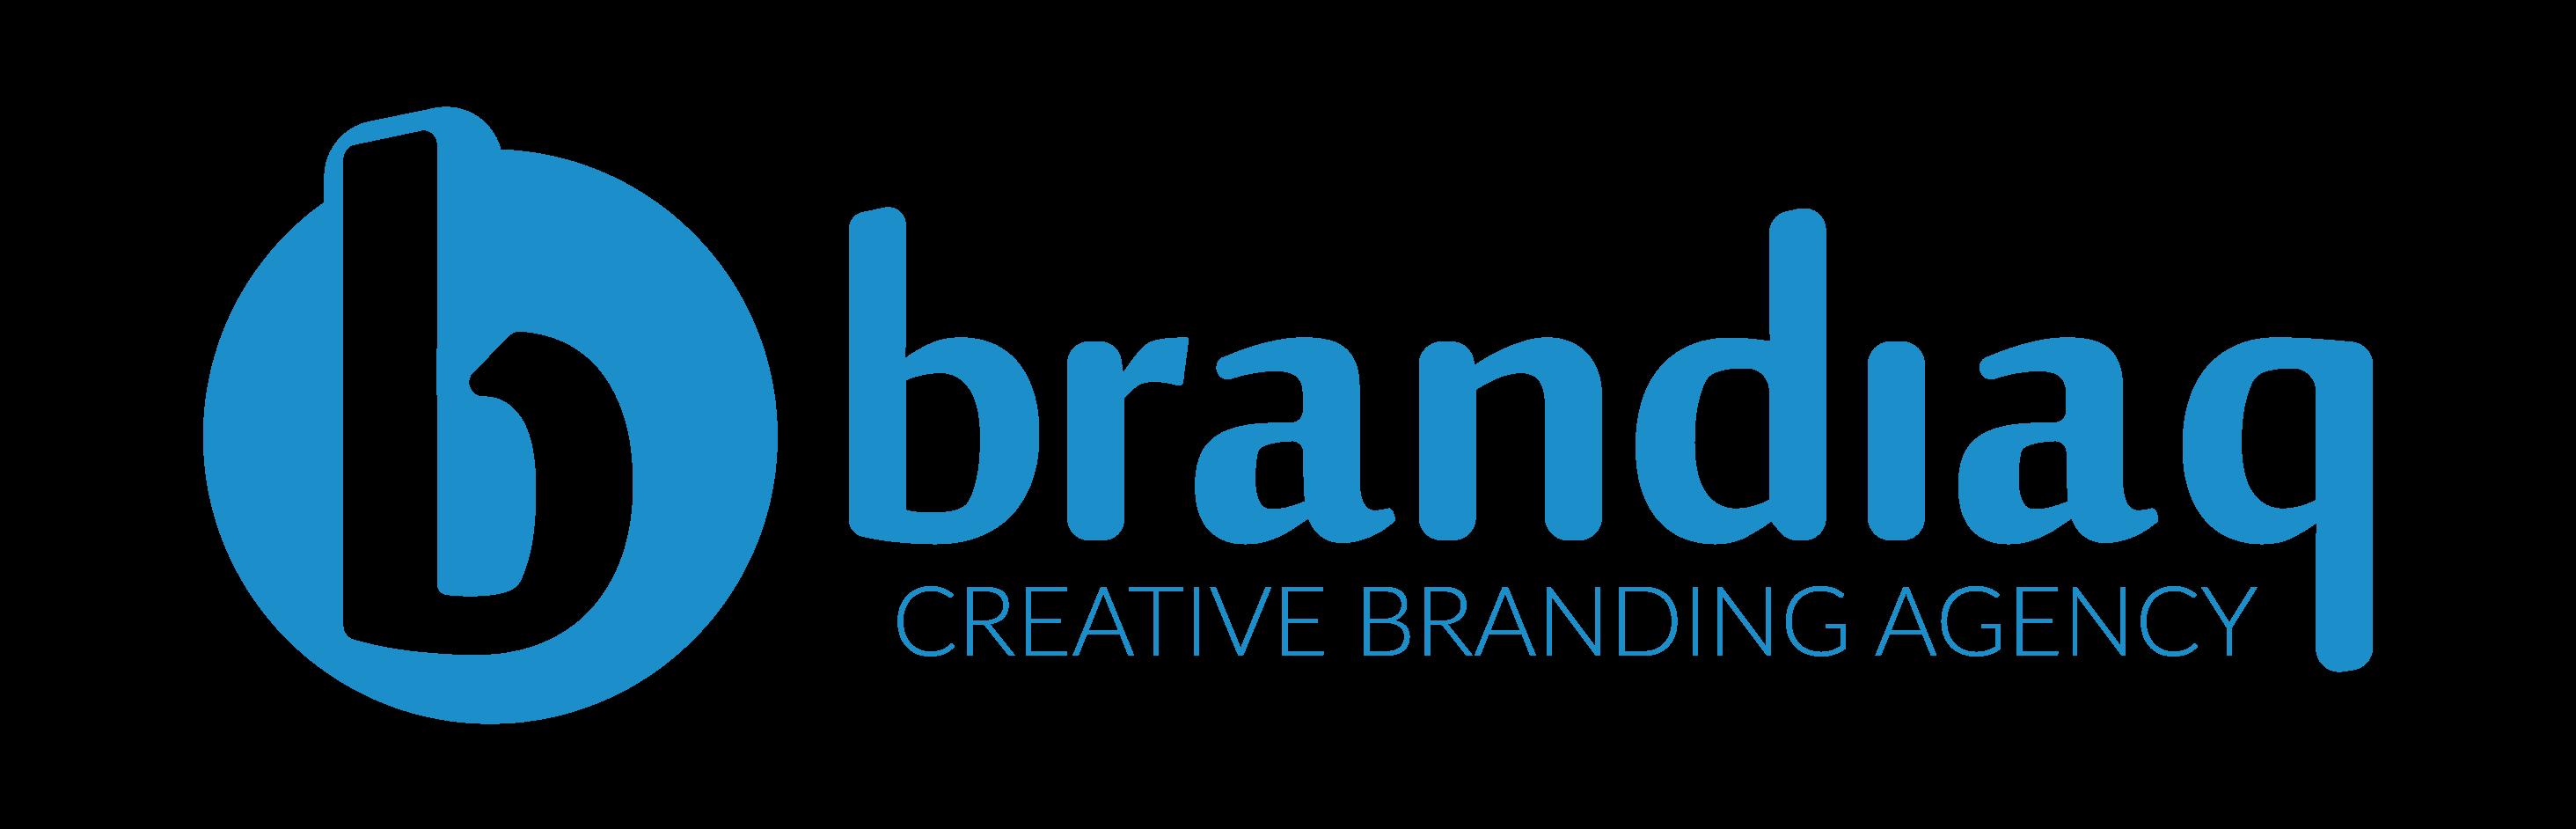 Creative Branding Agency